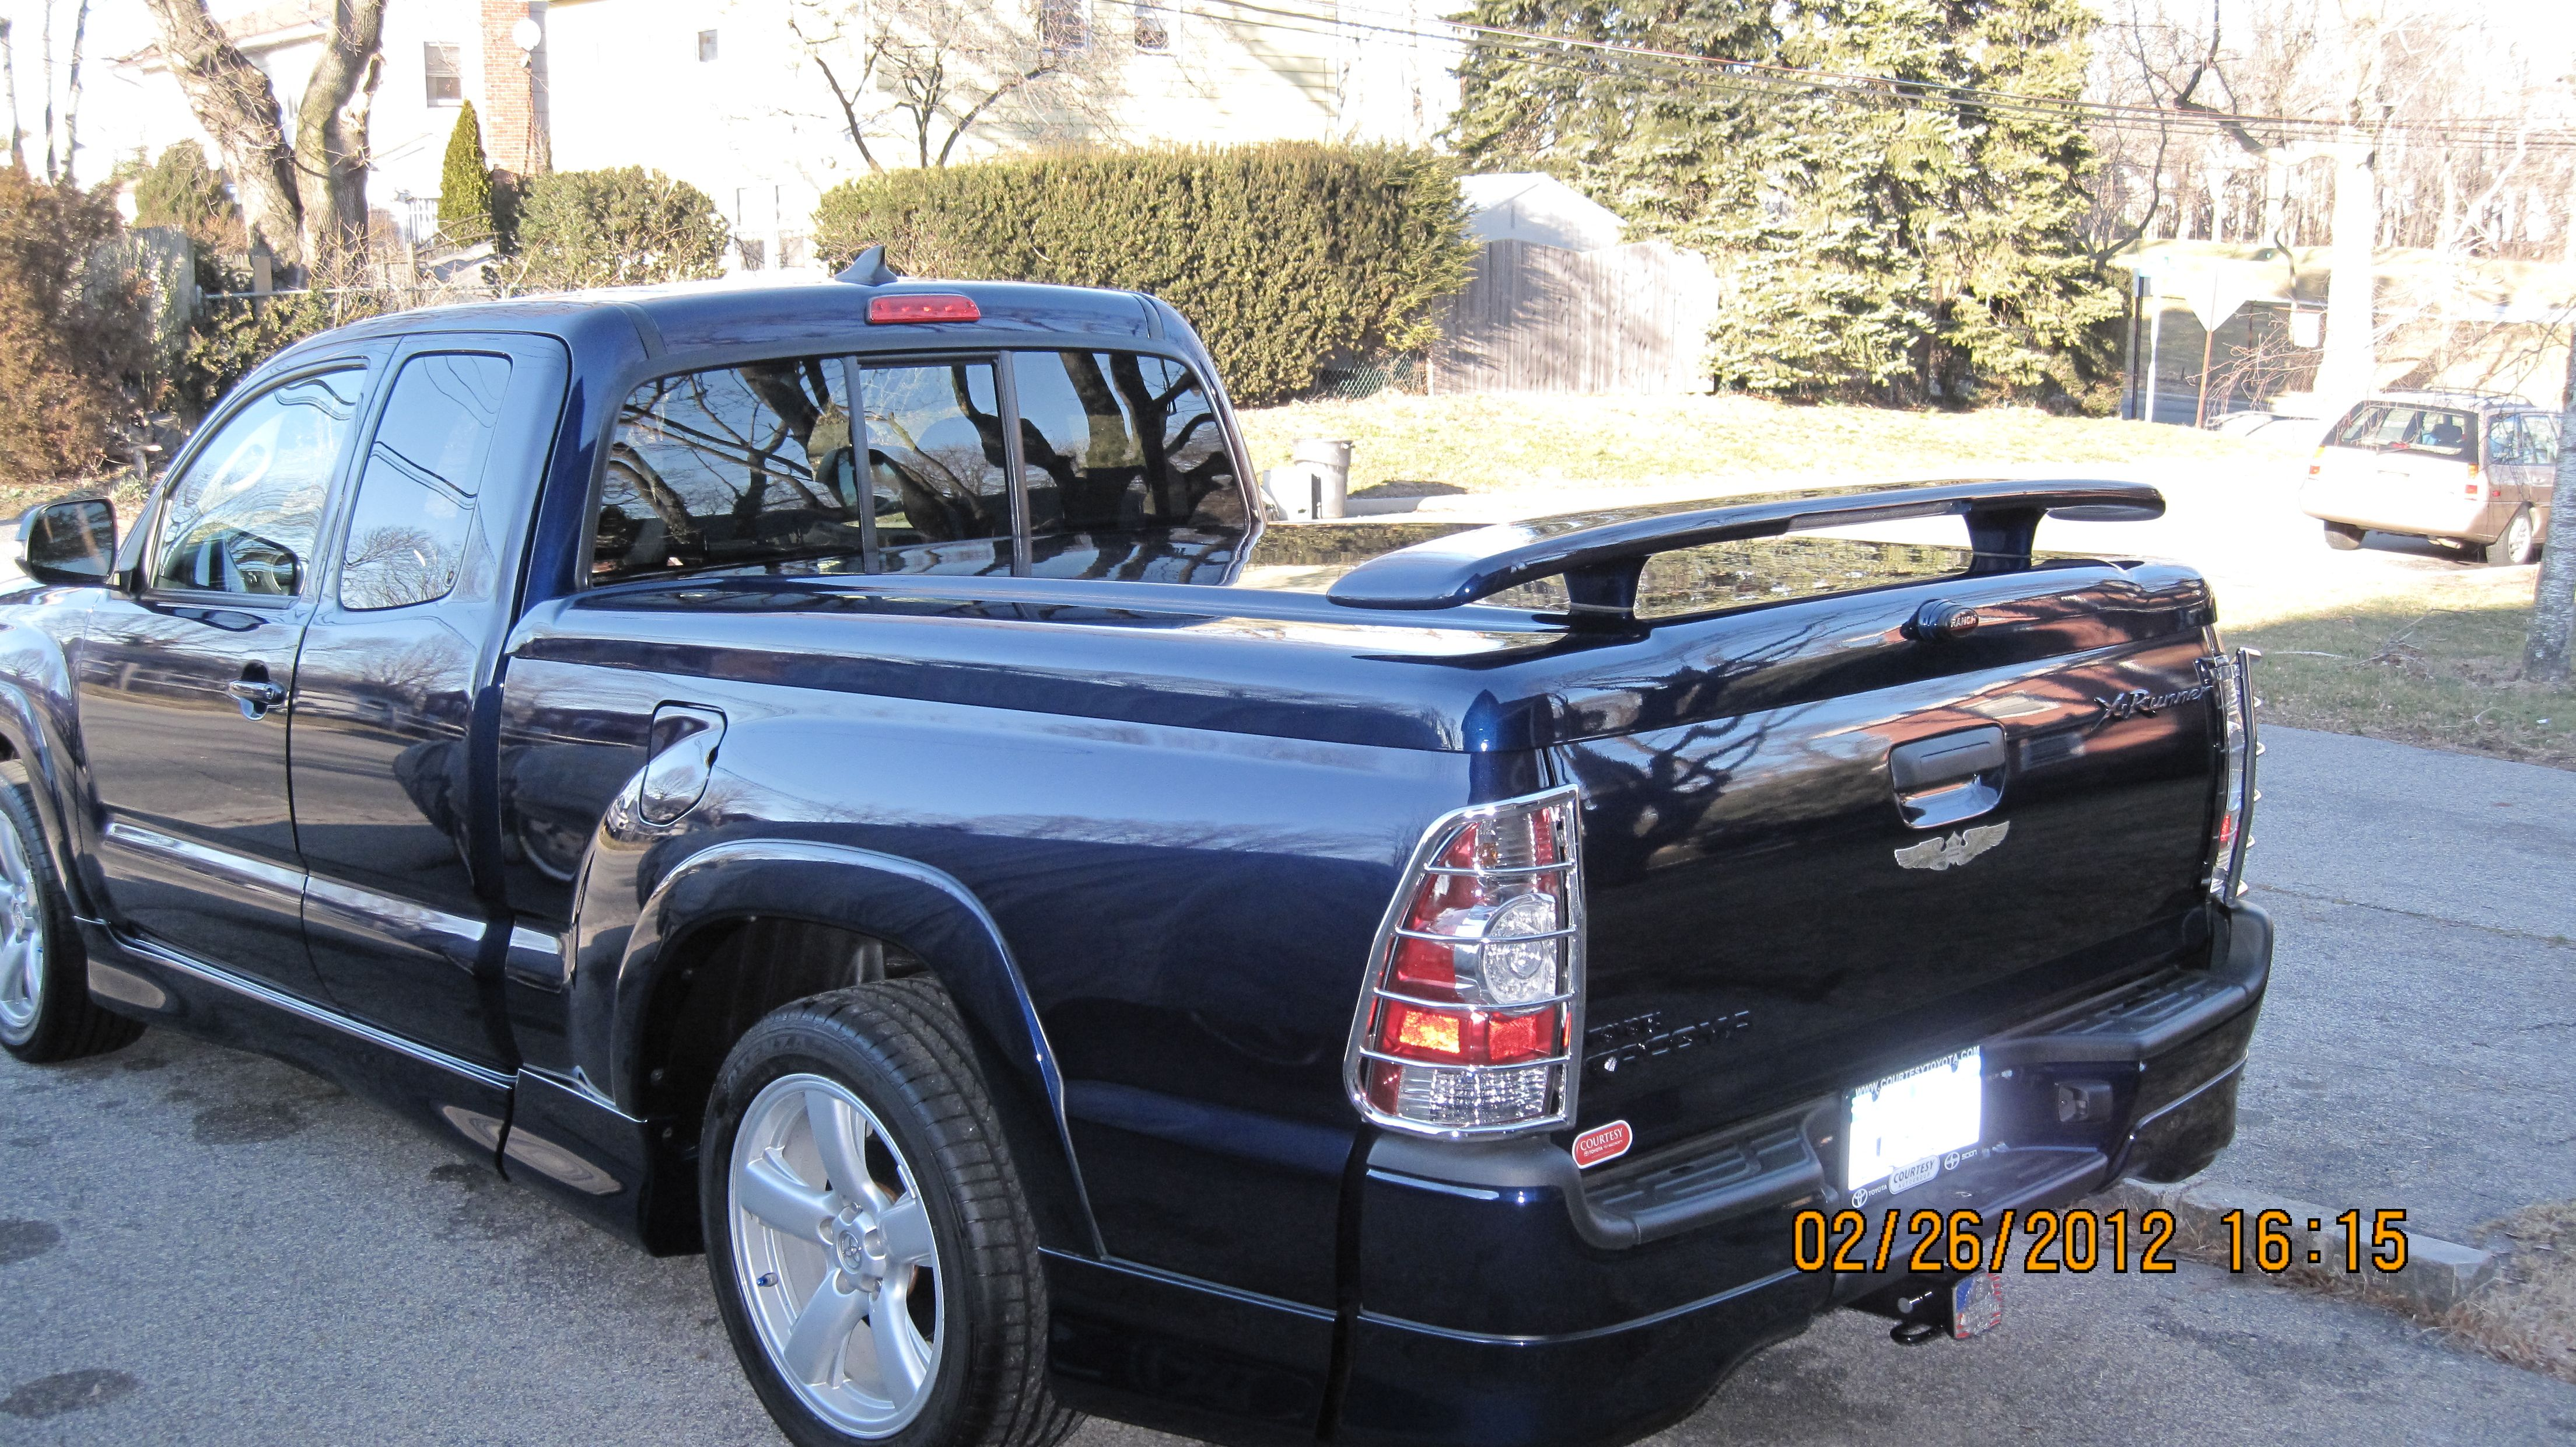 2012 Toyota XRunner 6' Bed Color 8P4 (Dark Blue